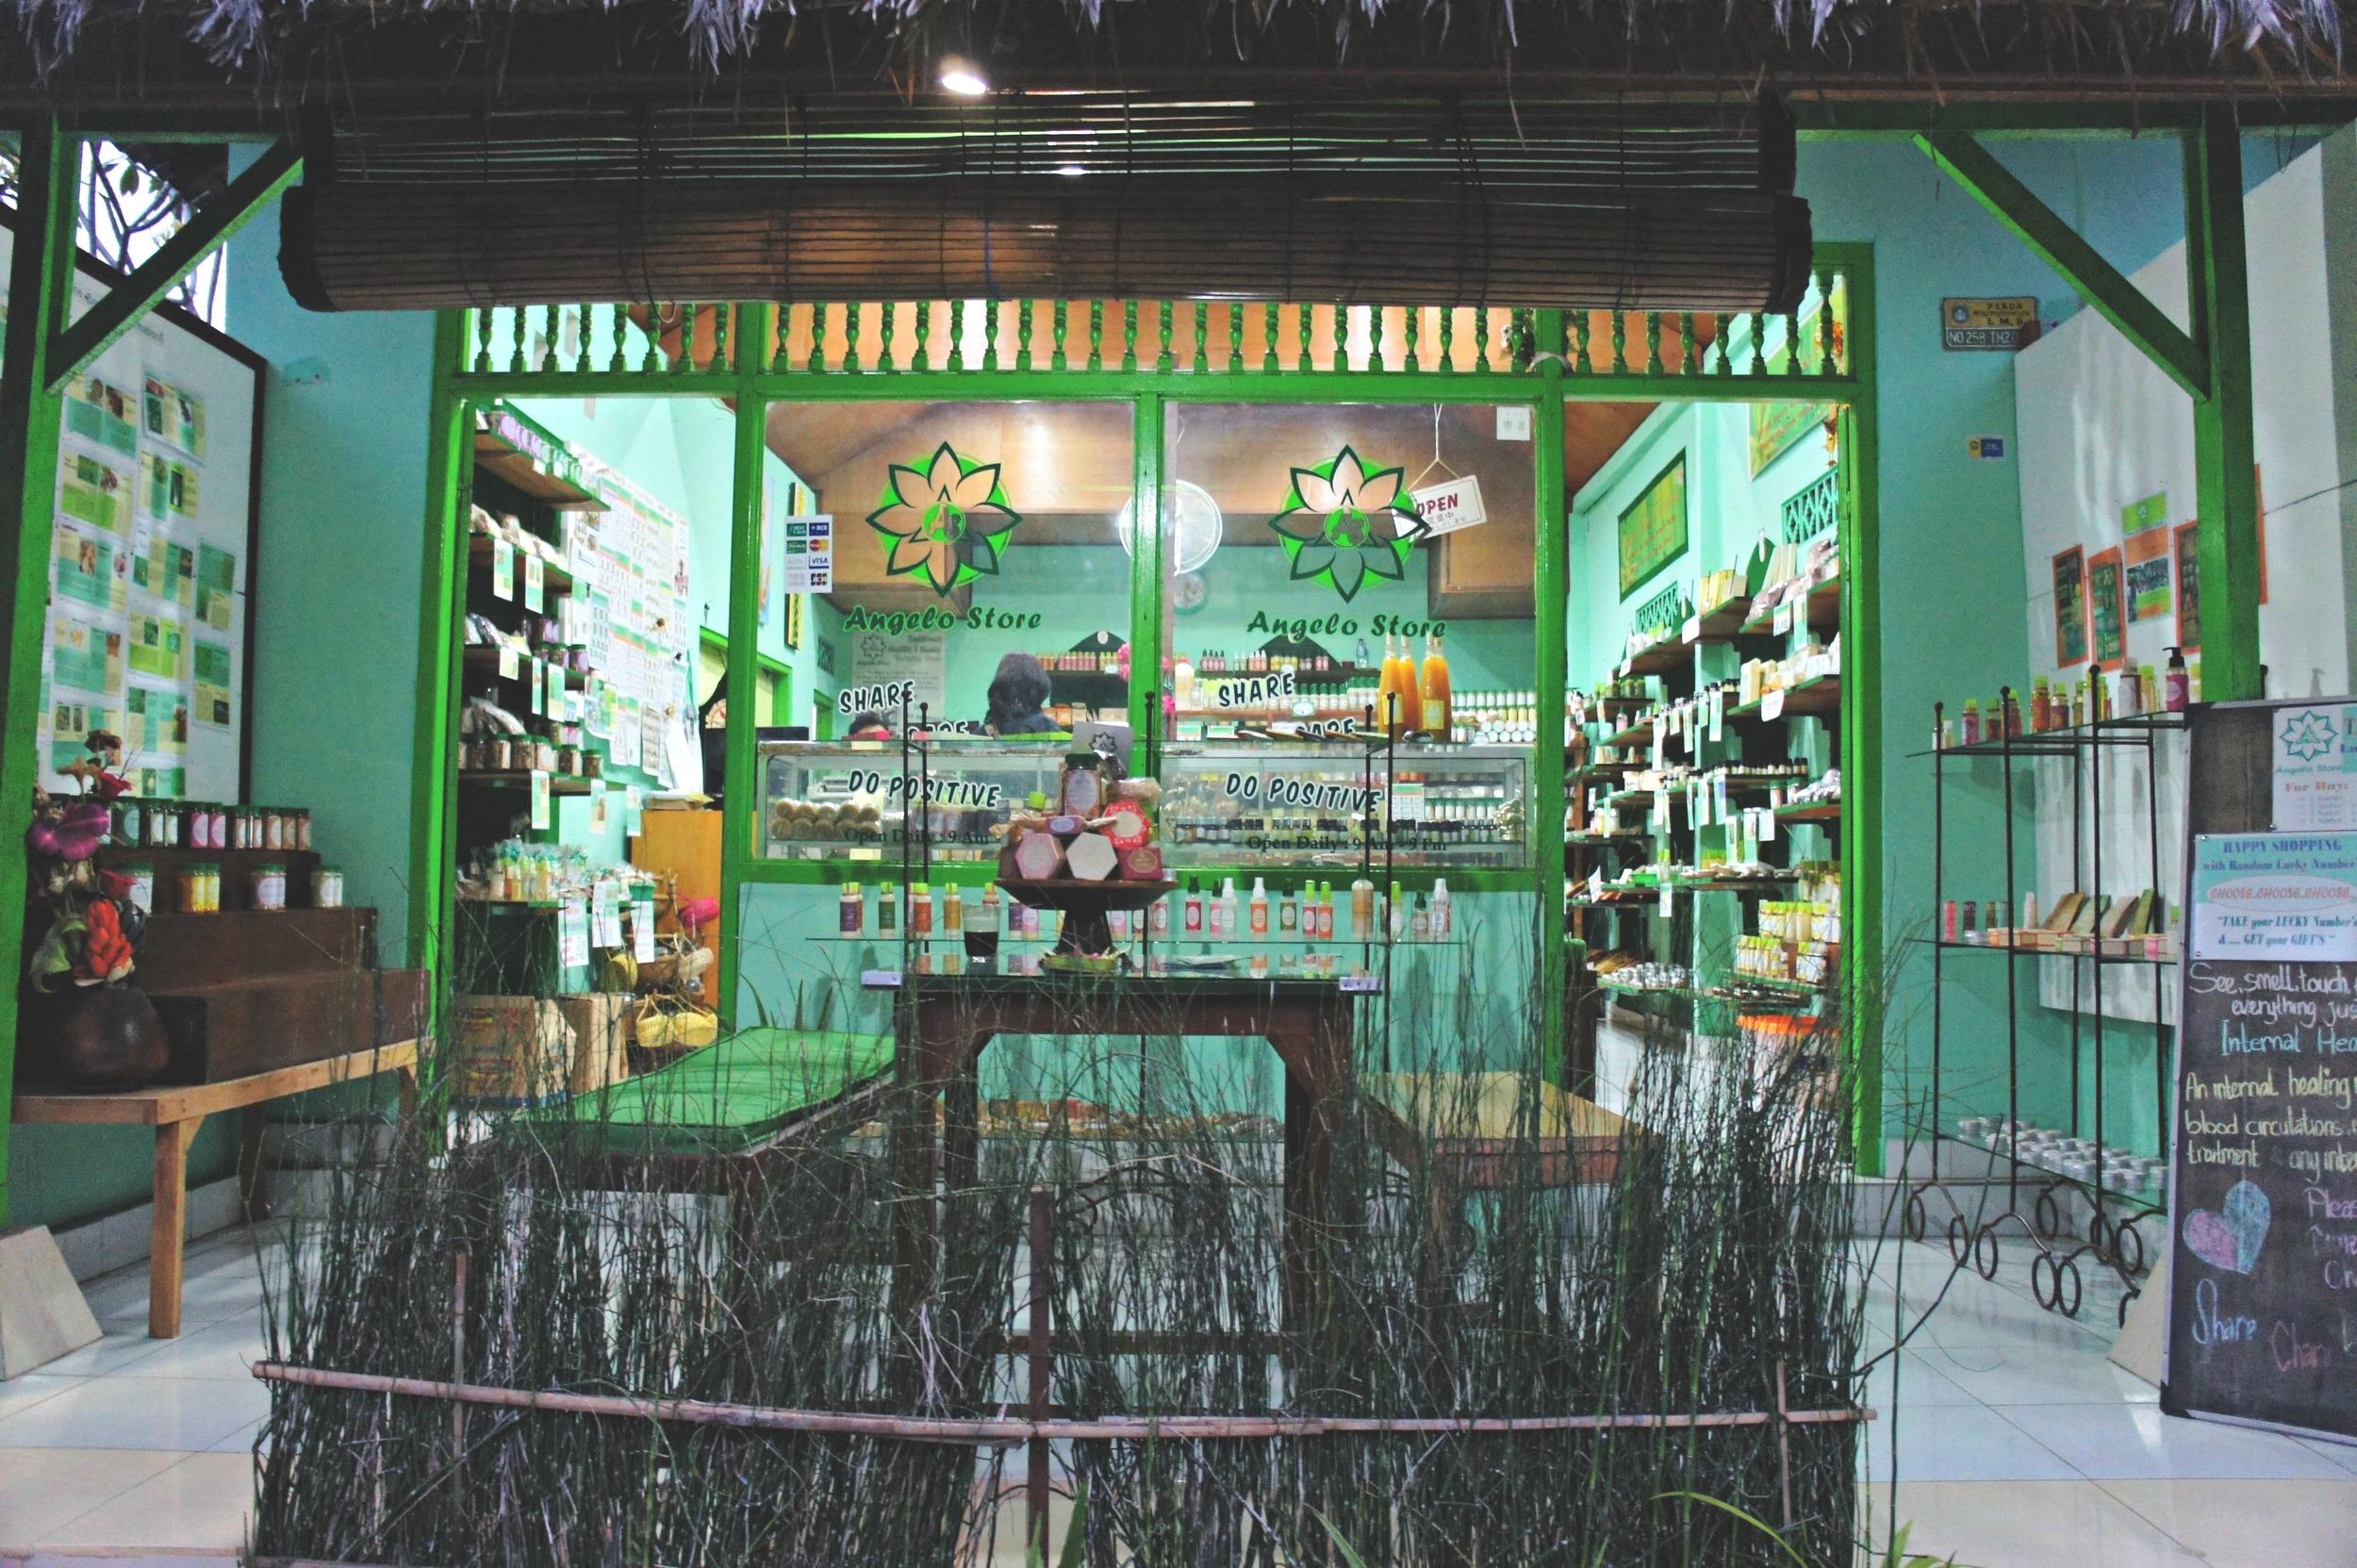 Angelo Store